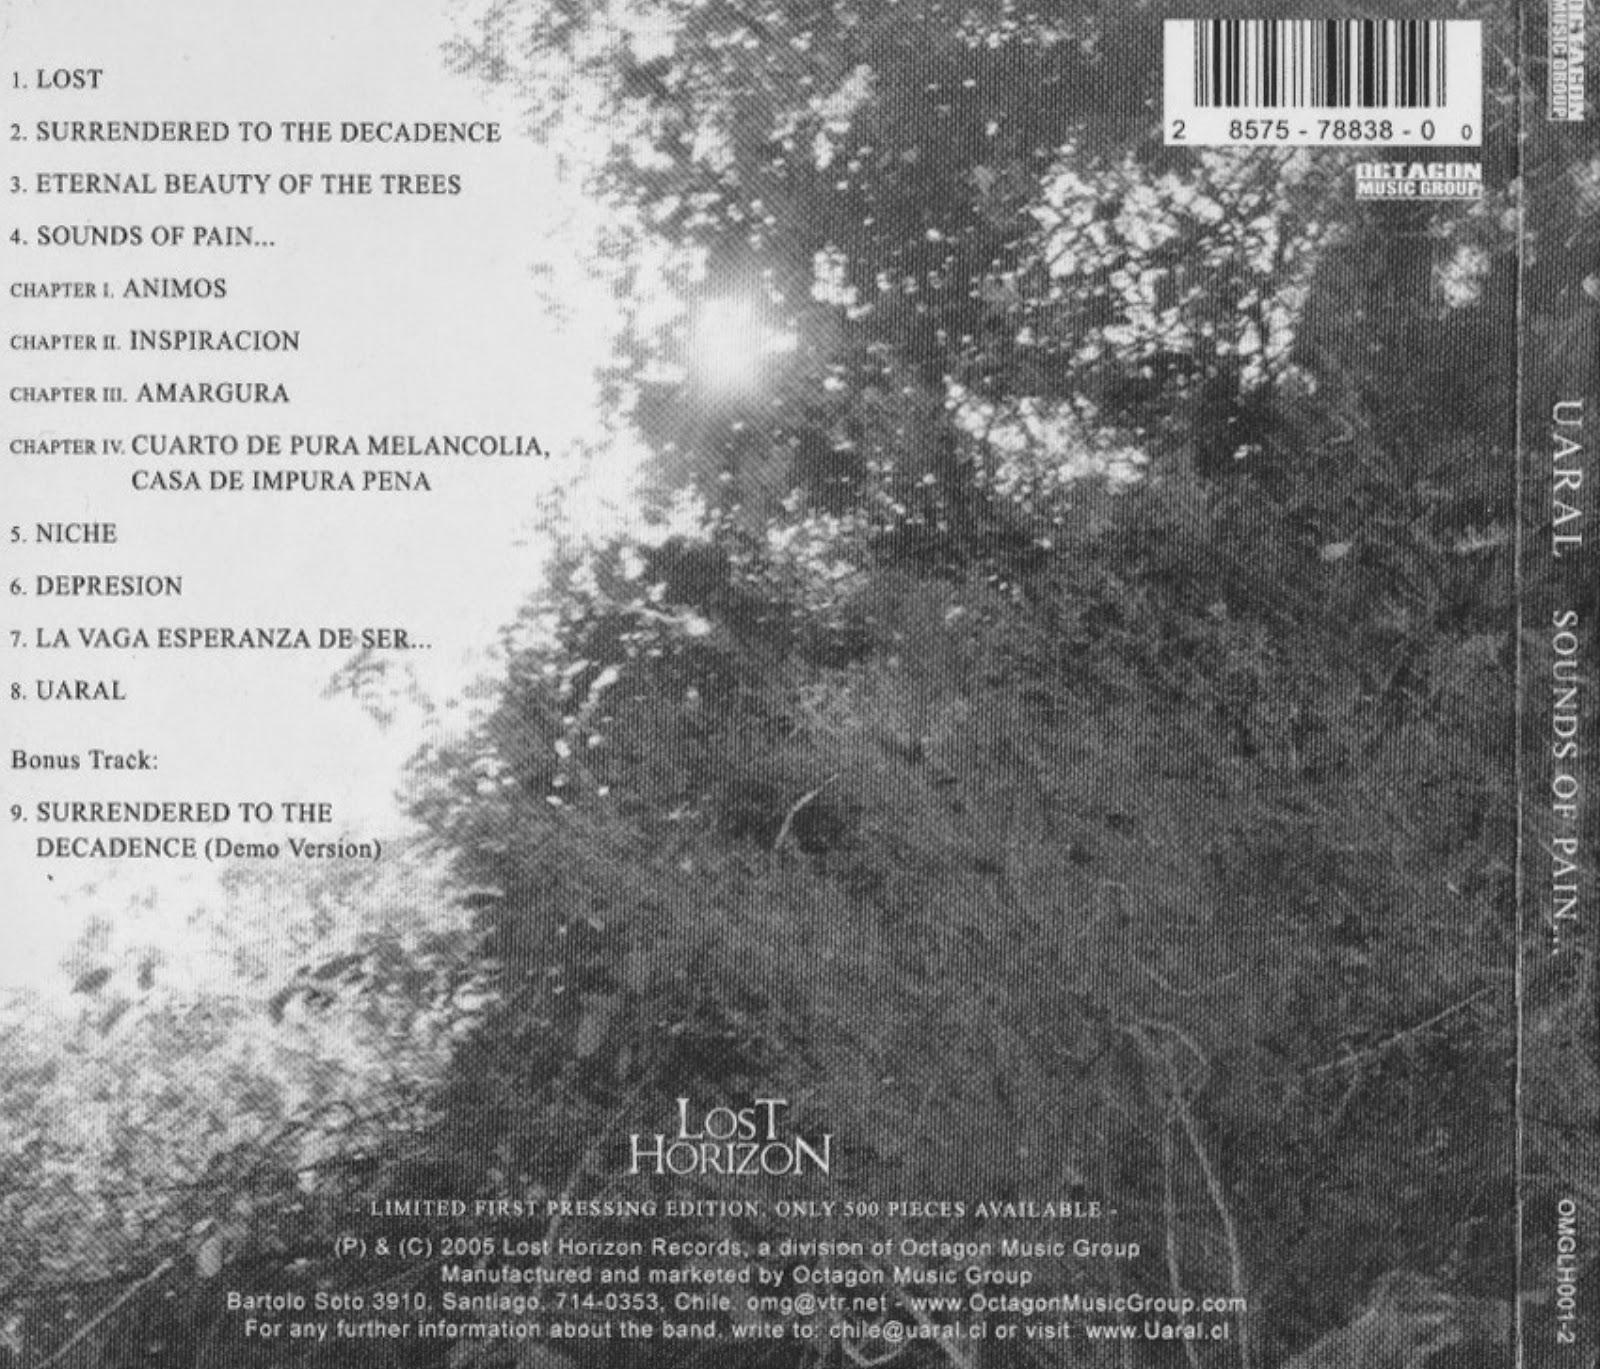 Sinta a Escuridão    Metal Blog: Uaral - Sounds of Pain